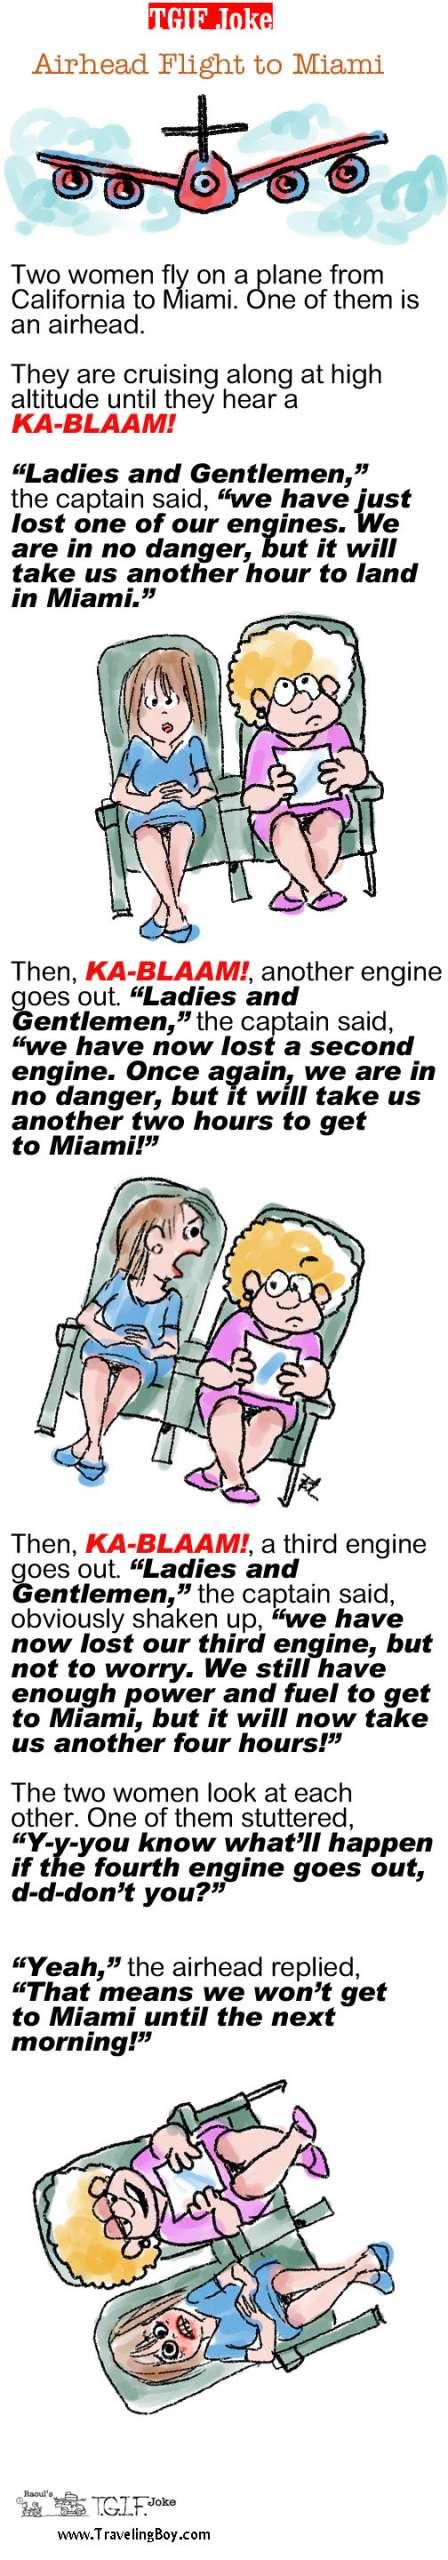 TGIF Joke of the Week: Airhead Flight to Miami